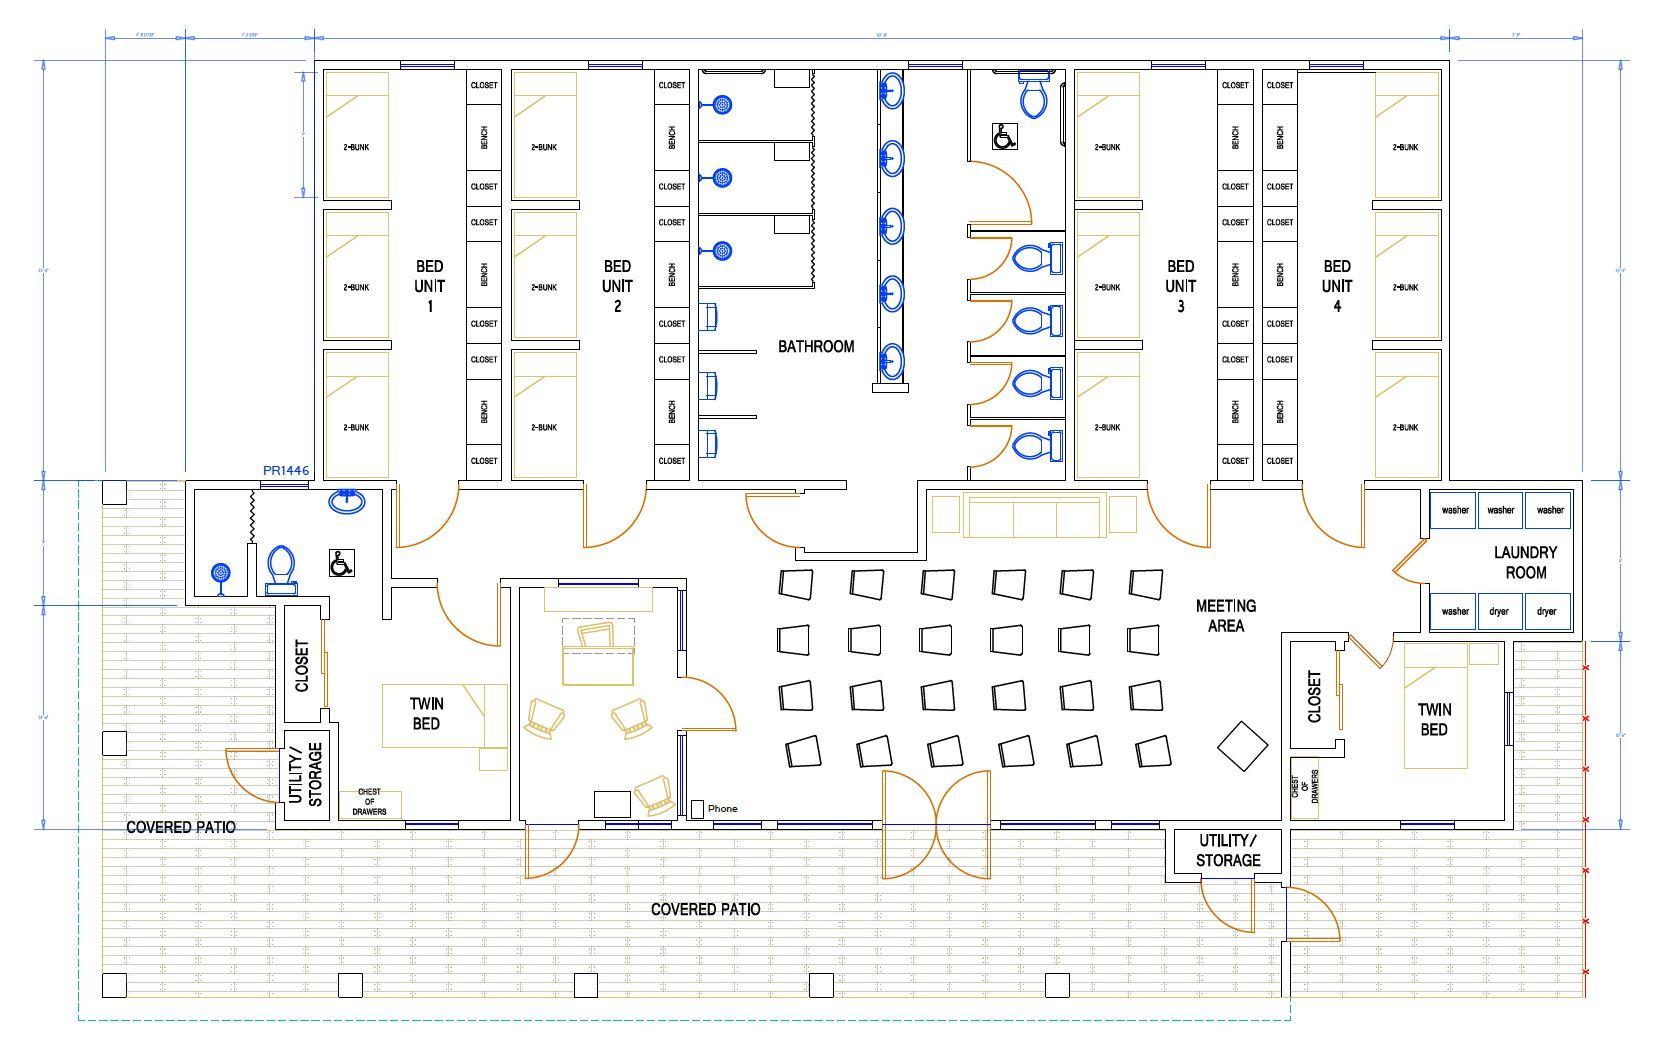 Dormitory - Floorplan